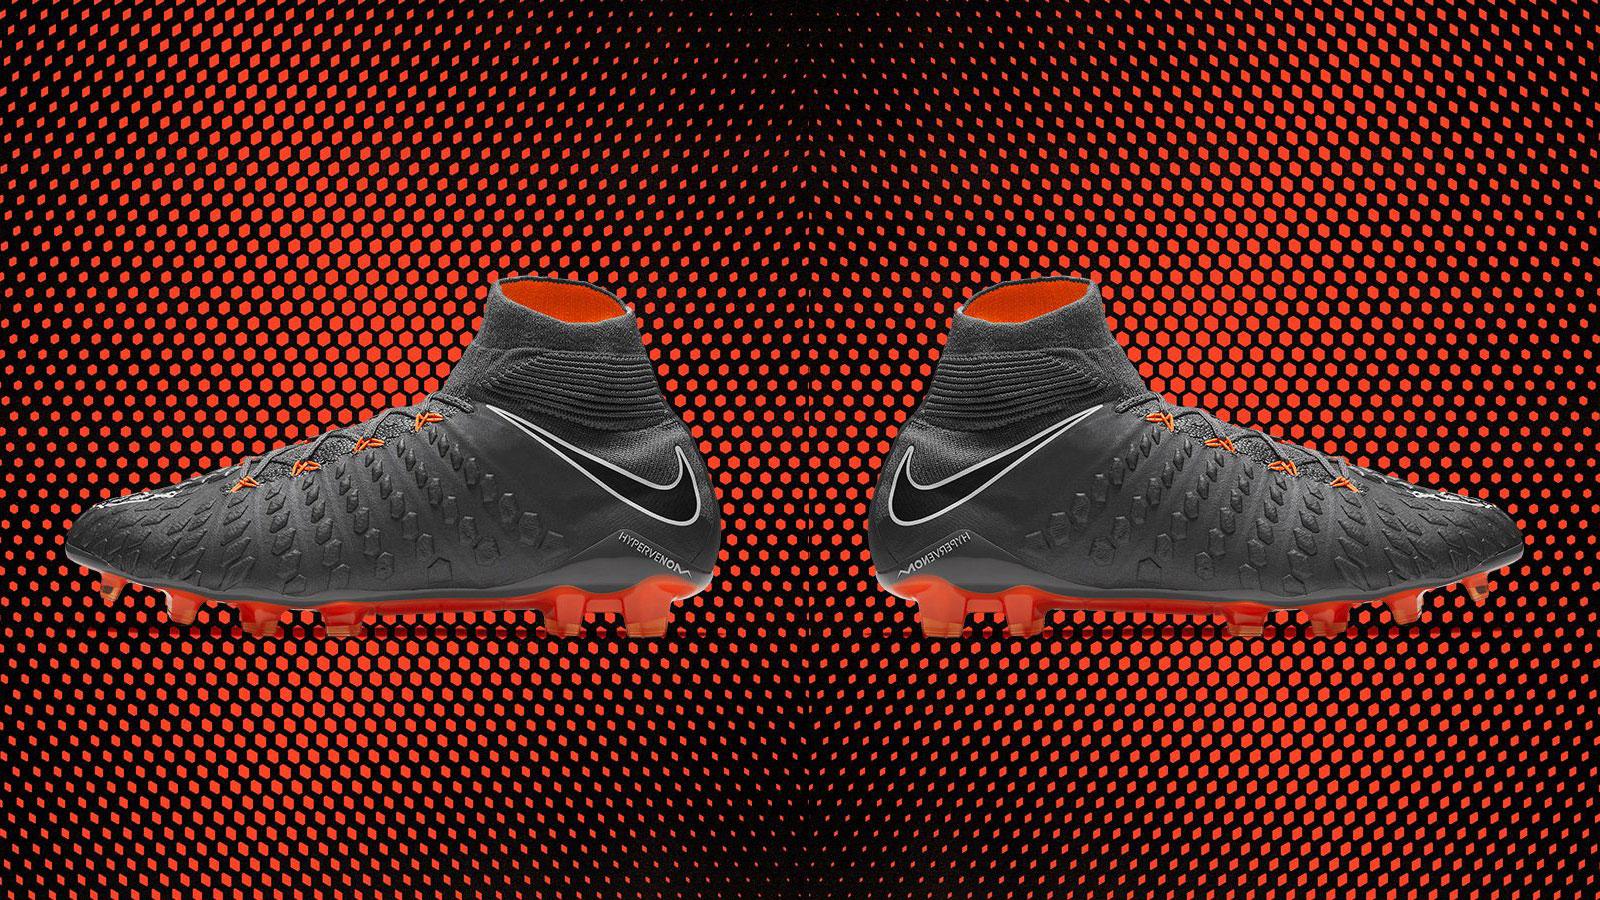 Nike Hypervenom Phantom III und Phantom III DF Fast AF Fußballschuhe